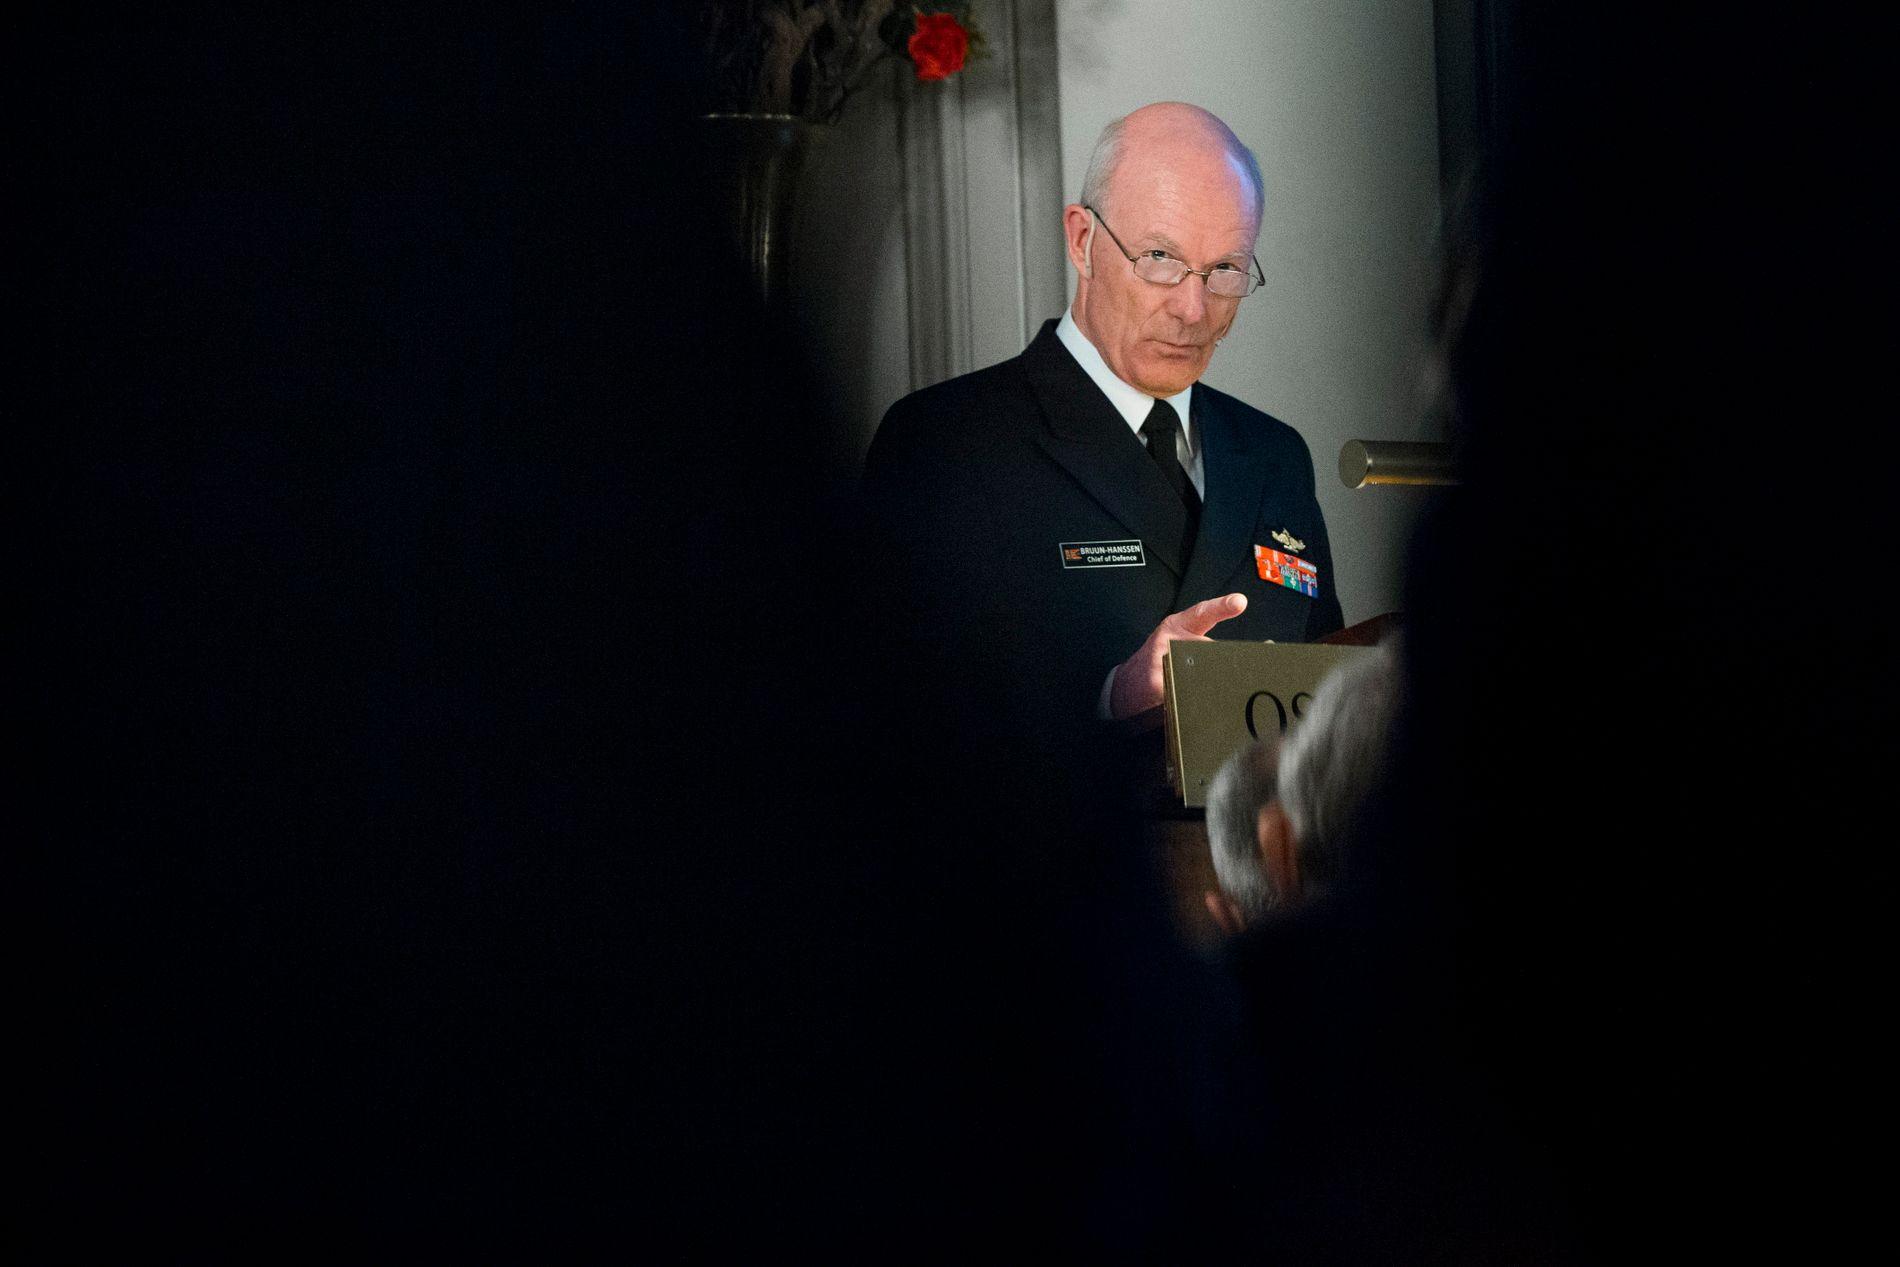 POLITIET BESTEMMER: Forsvarssjef Haakon Bruun-Hanssen holdt sin årlige statusoppdatering i Oslo Militære Samfund mandag kveld.